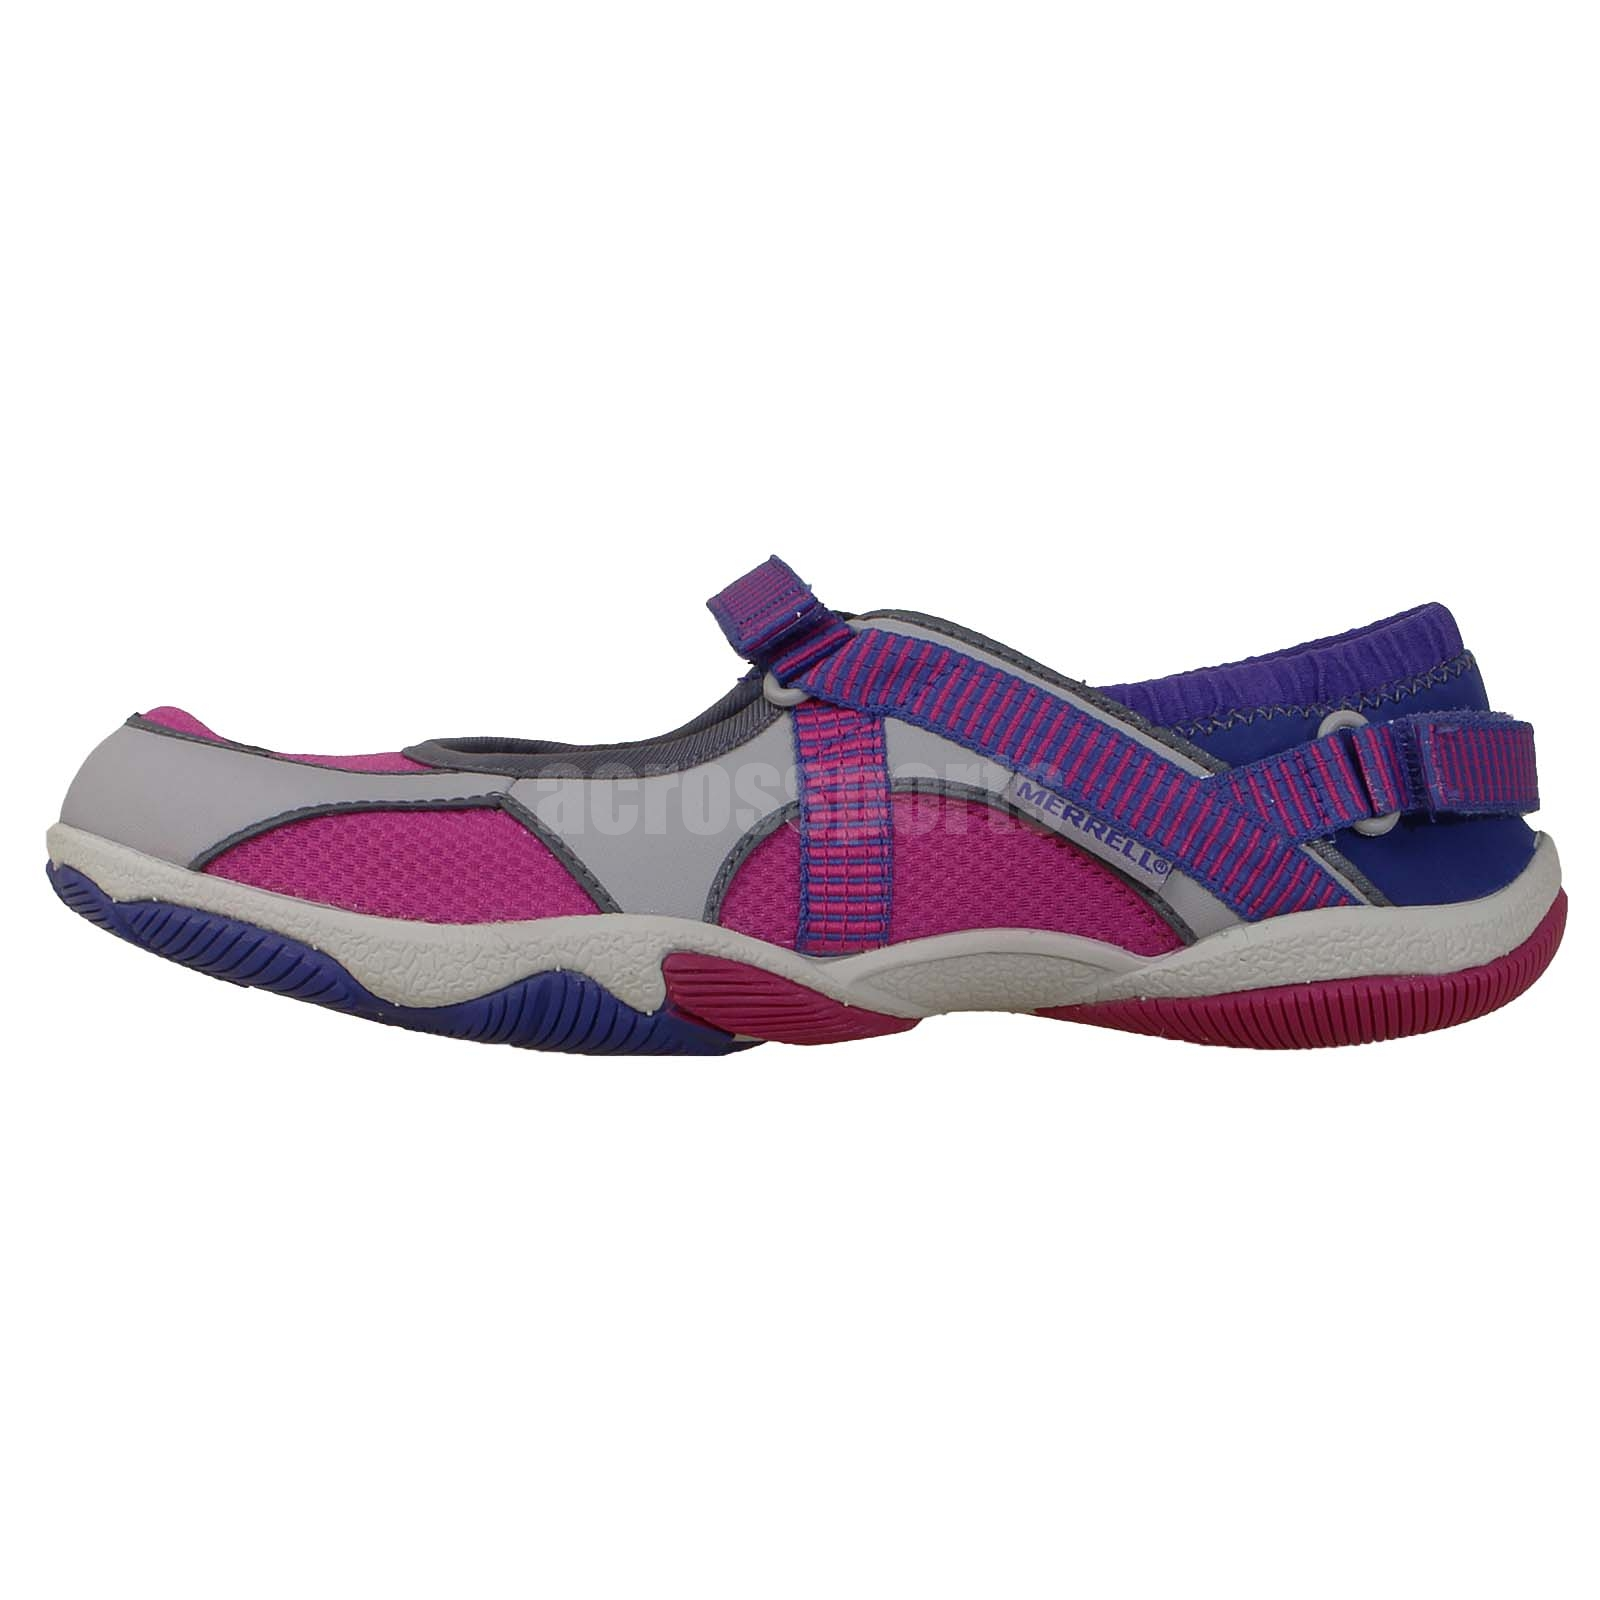 merrell river glove purple grey 2014 new womens outdoors